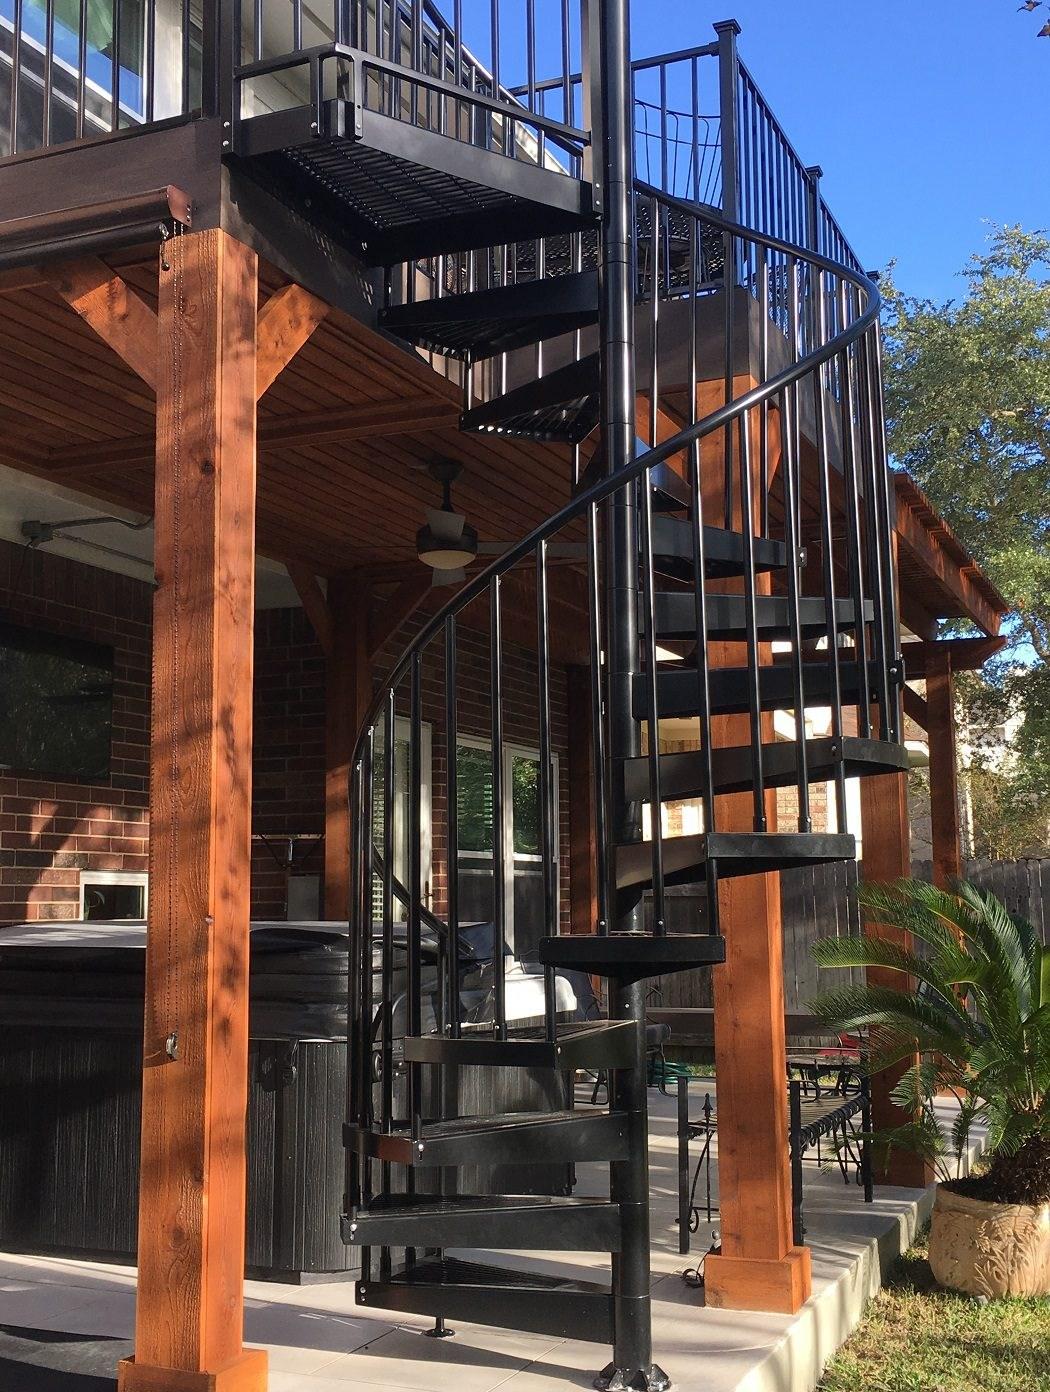 2 Story Decks Austin Decks Pergolas Covered Patios Porches More | Spiral Staircase For Outside Deck | Iron | Custom | Double Spiral | Railing | Portable Rectangular Concrete